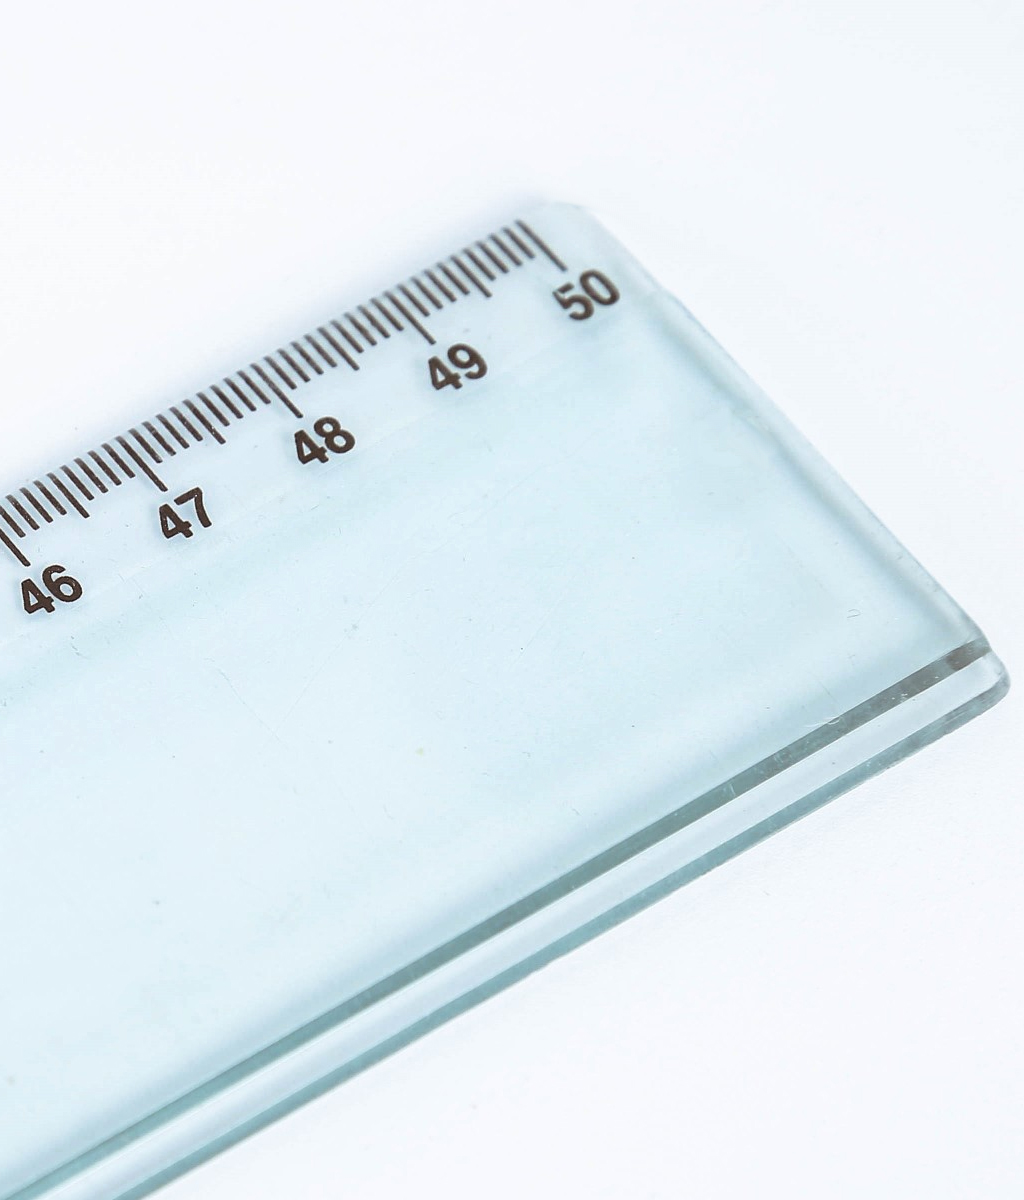 Règle plate 50 cm RP 50